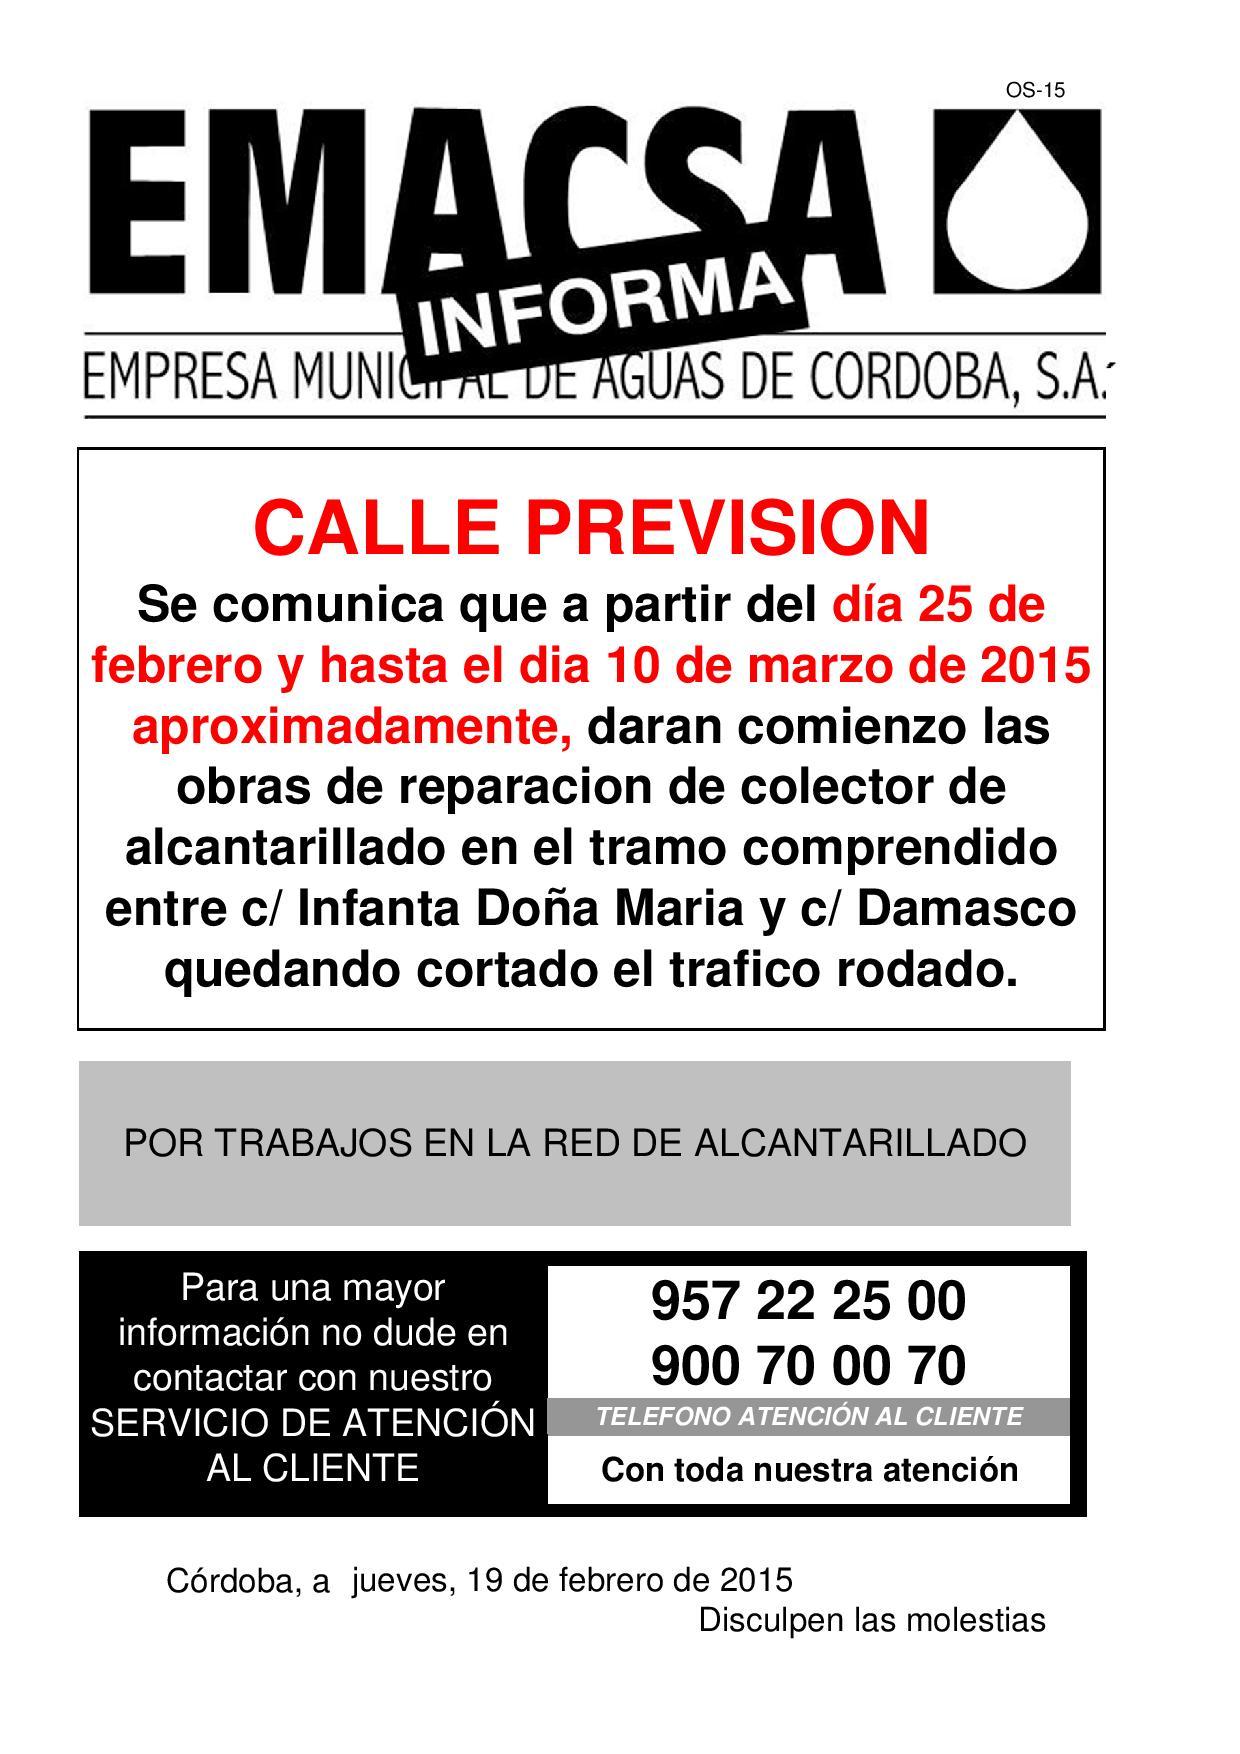 CALLE PREVISION